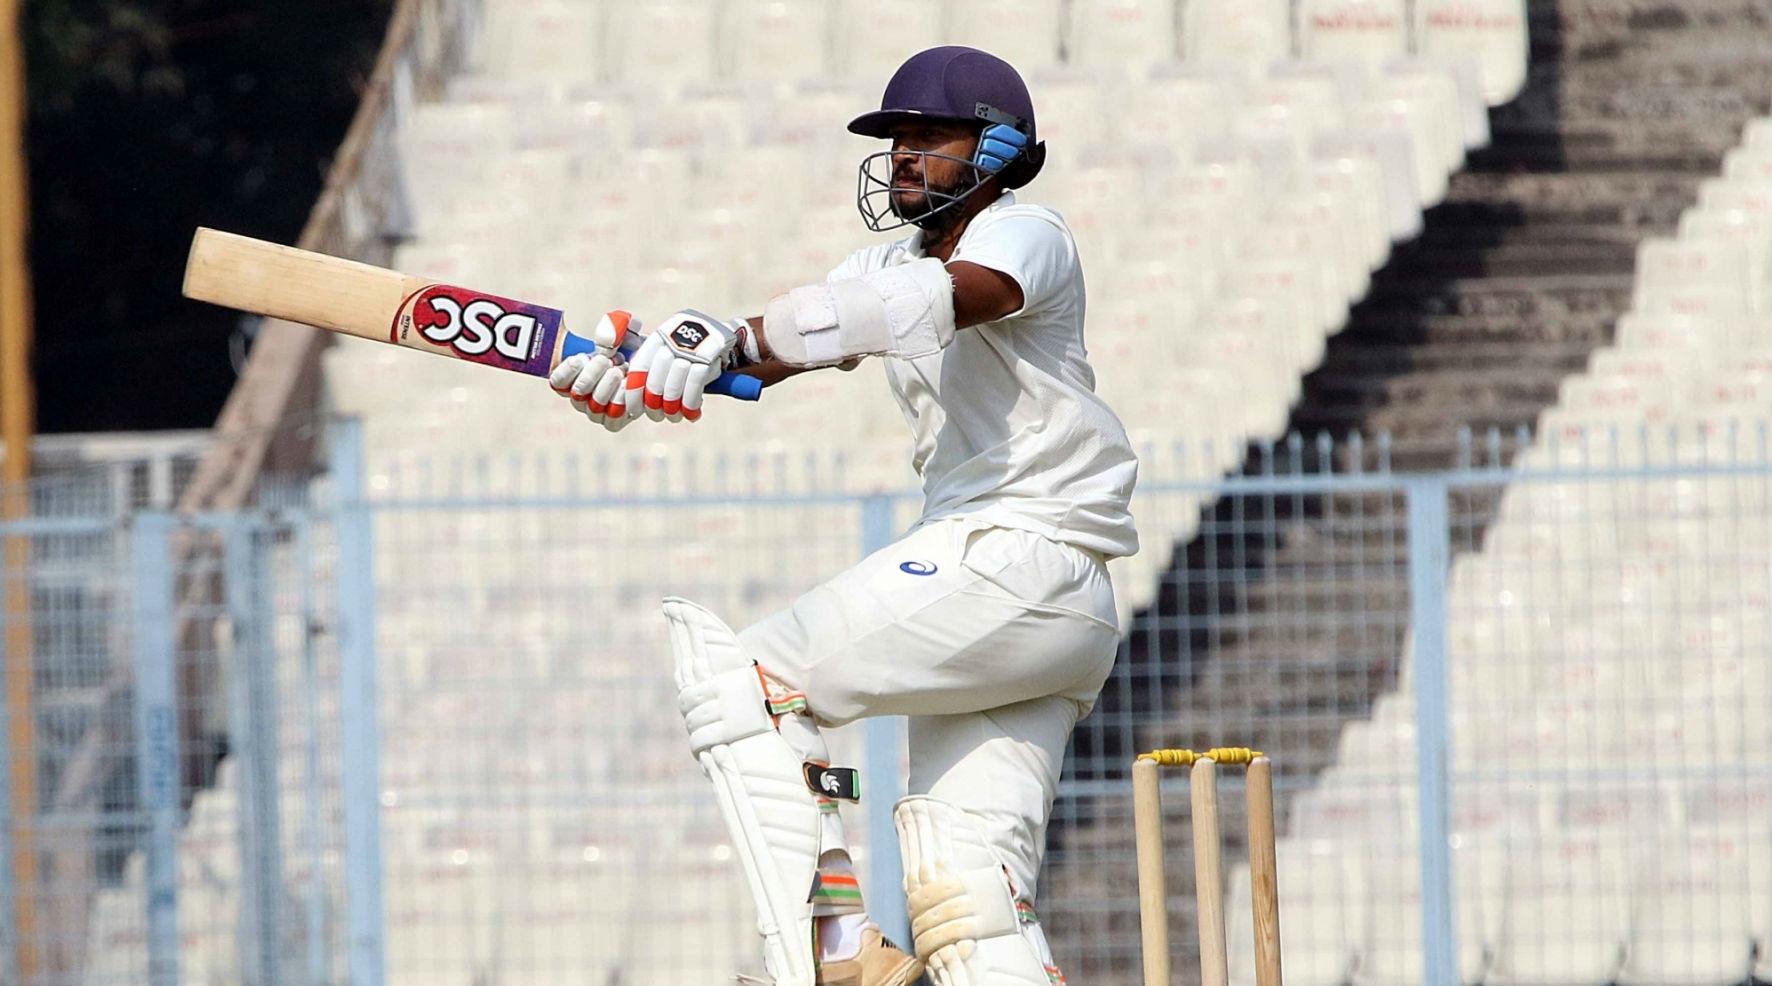 Ranji Trophy 2019-20: Jalaj Saxena Shines in Kerala's Win Against Punjab